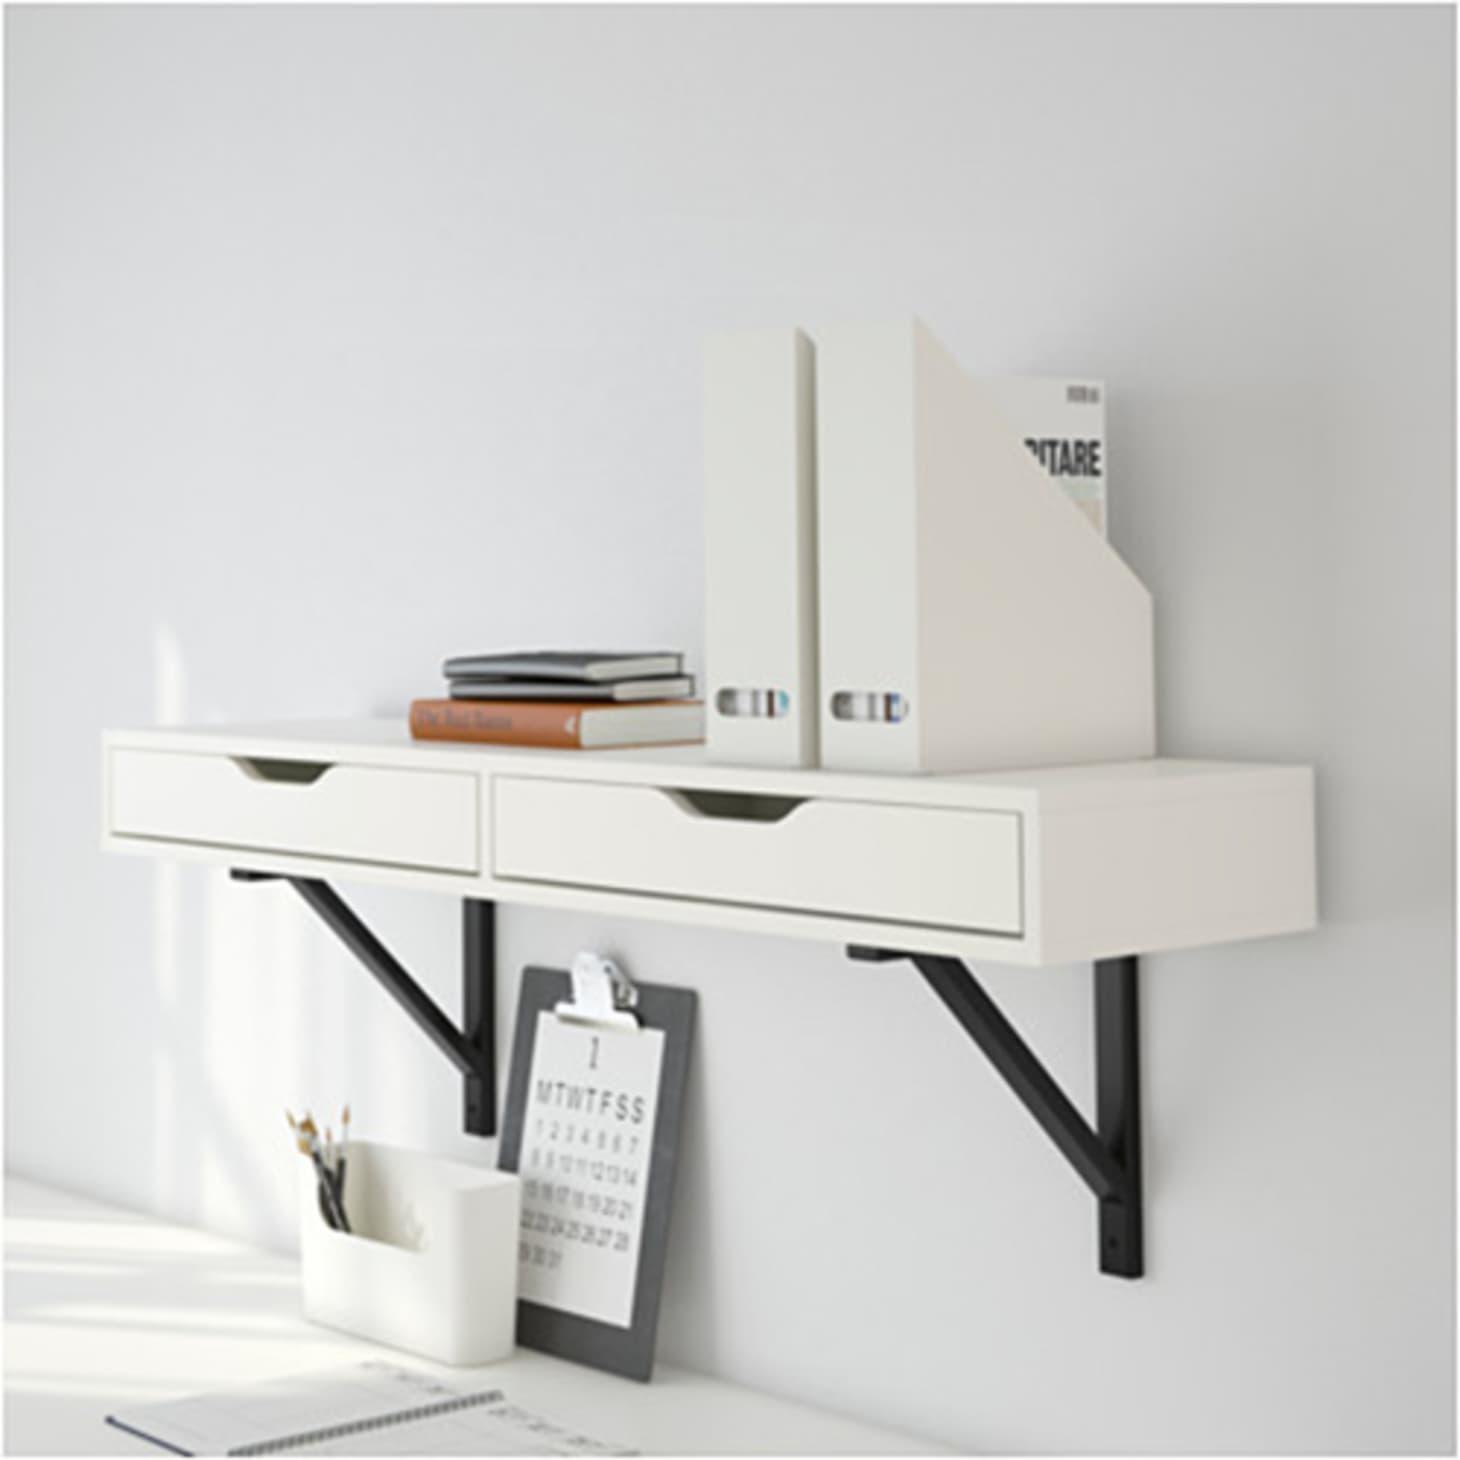 IKEA EKBY ALEX Shelf Ideas and Inspiration   Apartment Therapy